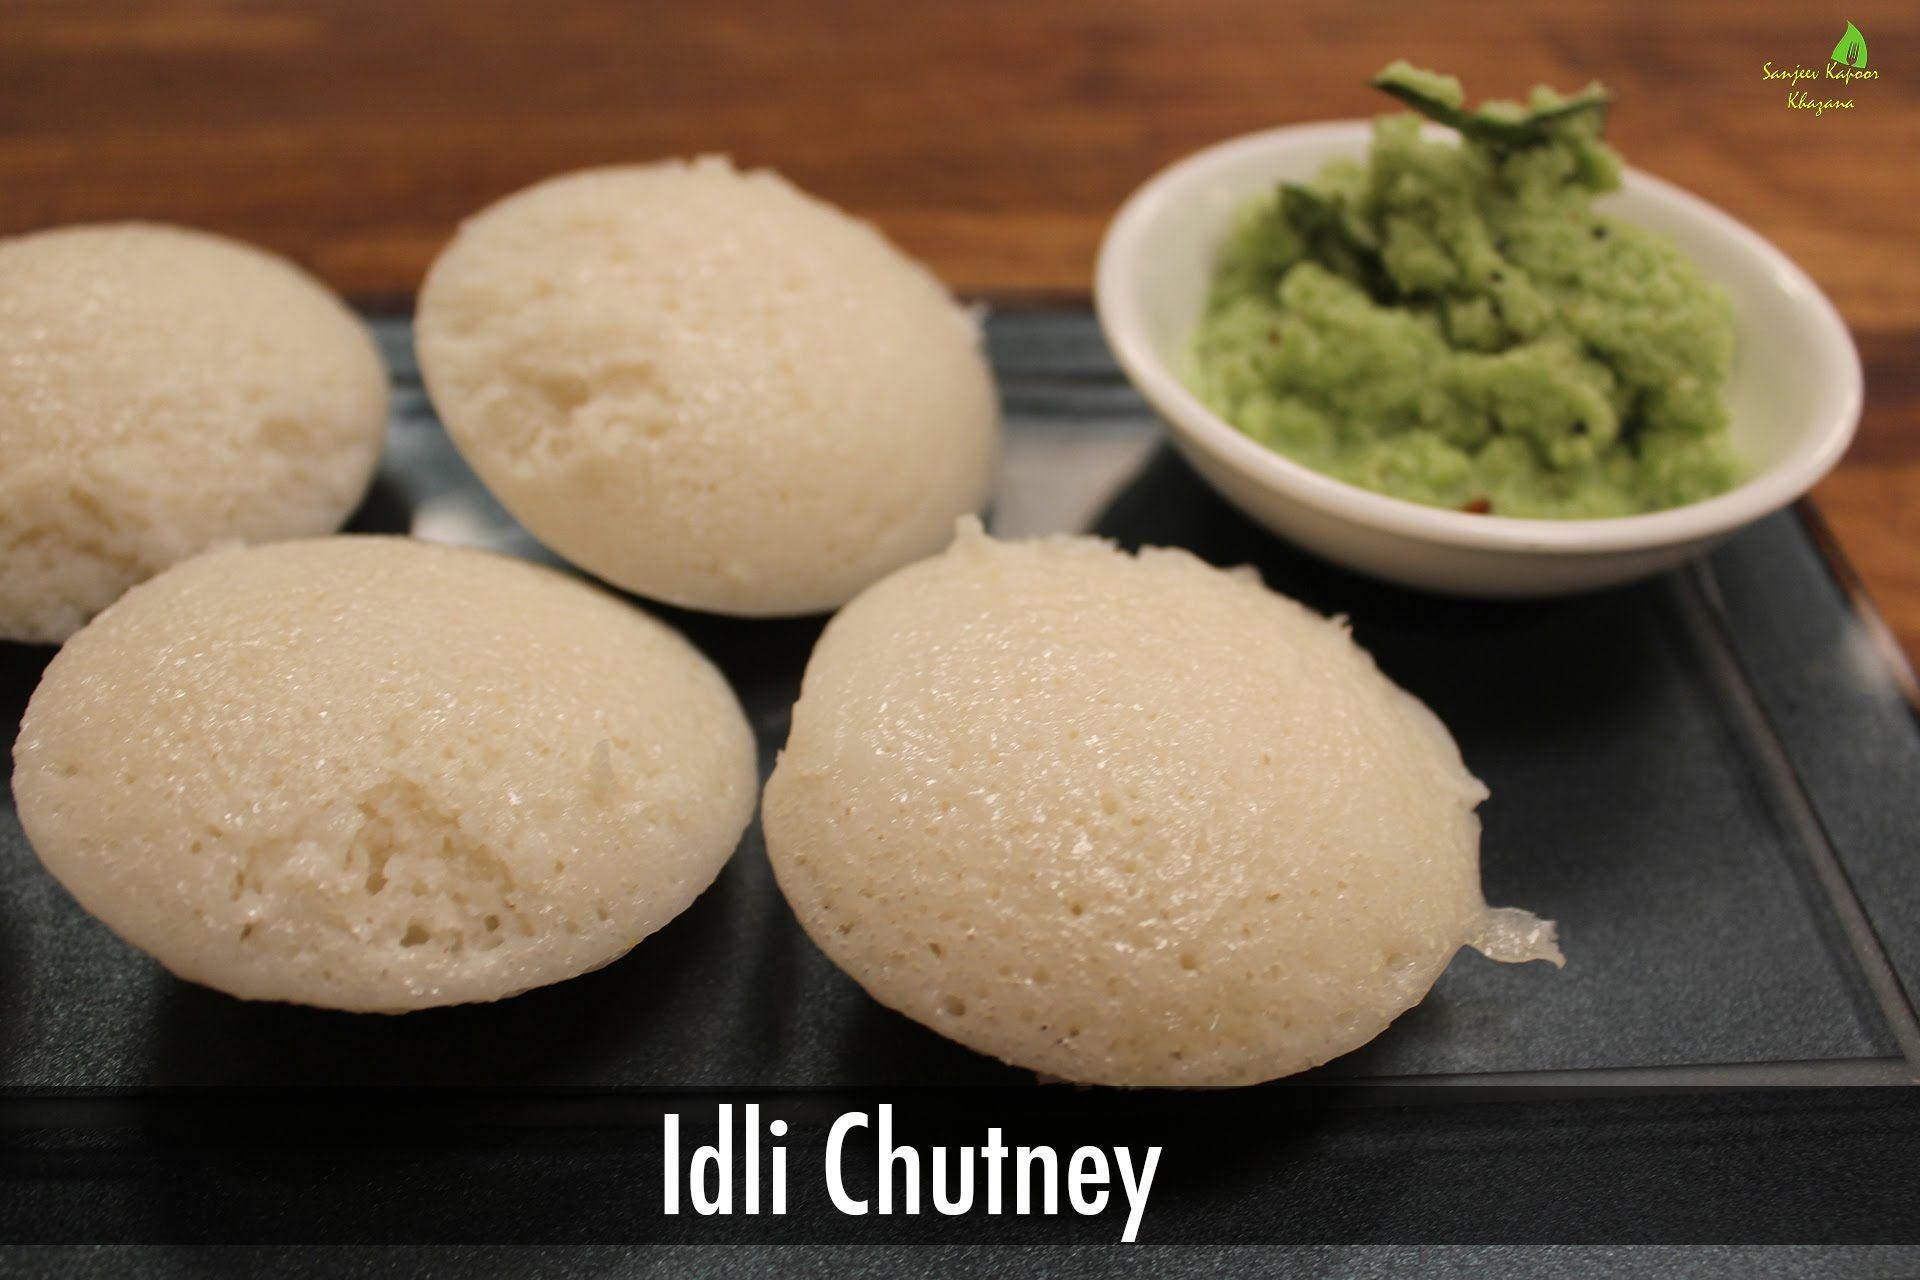 Idli chutney south indian cuisine sanjeev kapoor khazana yumm idli chutney south indian cuisine sanjeev kapoor khazana forumfinder Image collections